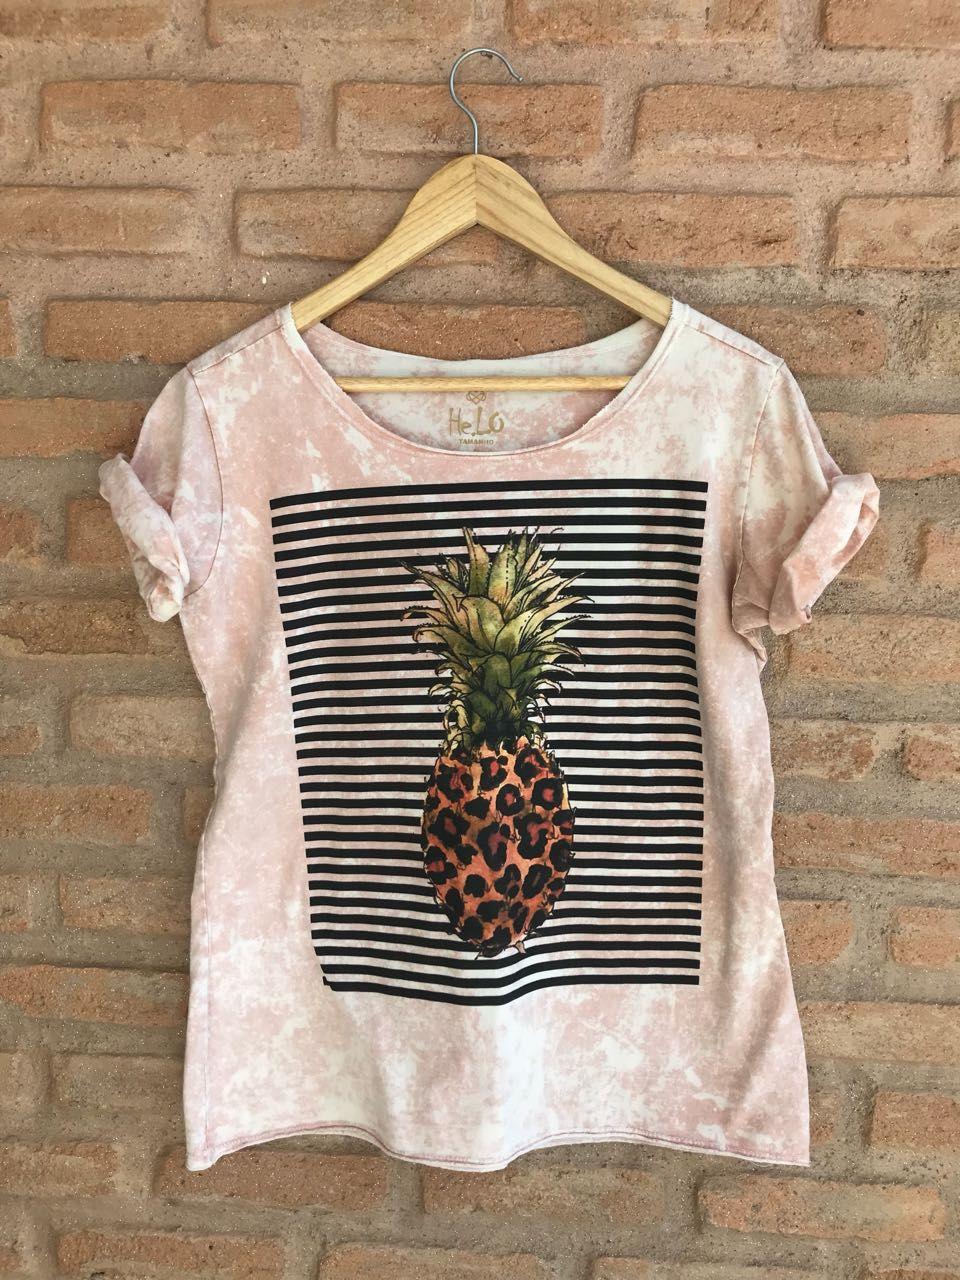 13ced932a T-shirt feminina descolada estampa de abacaxi exclusiva. R$59,90. Compre  pelo Mercado Livre.